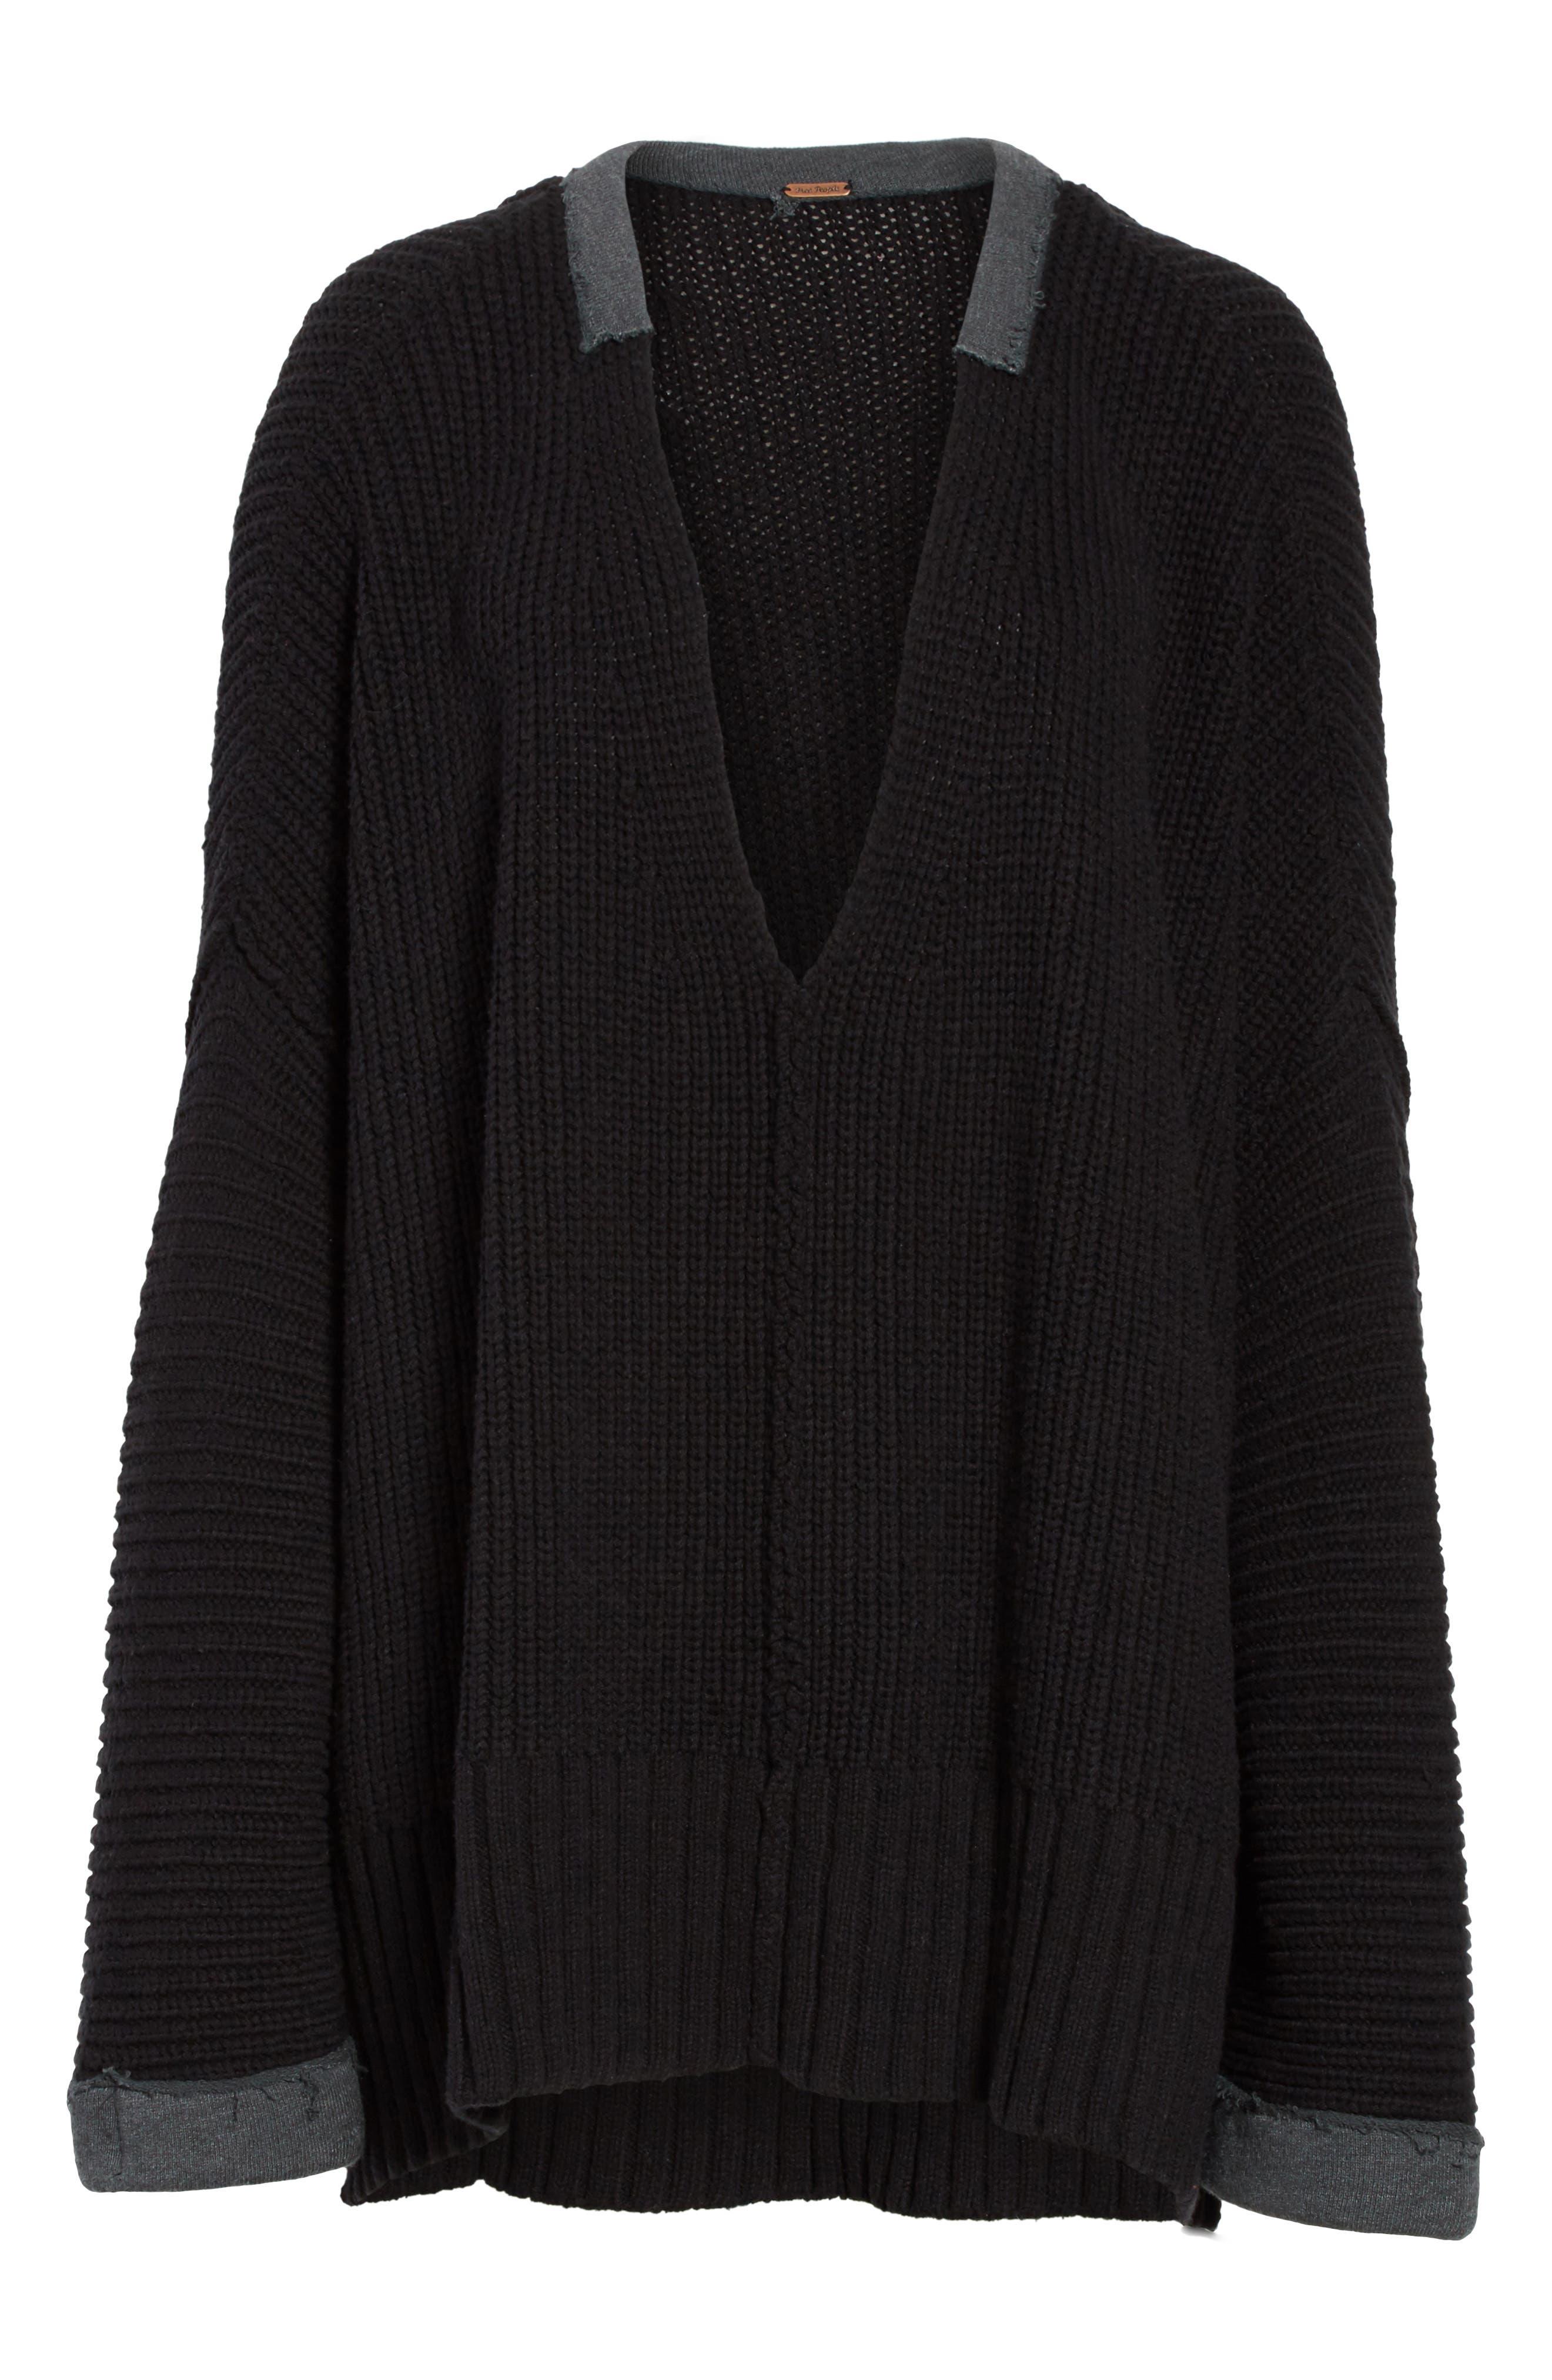 Take Over Me V-Neck Sweater,                             Alternate thumbnail 6, color,                             001